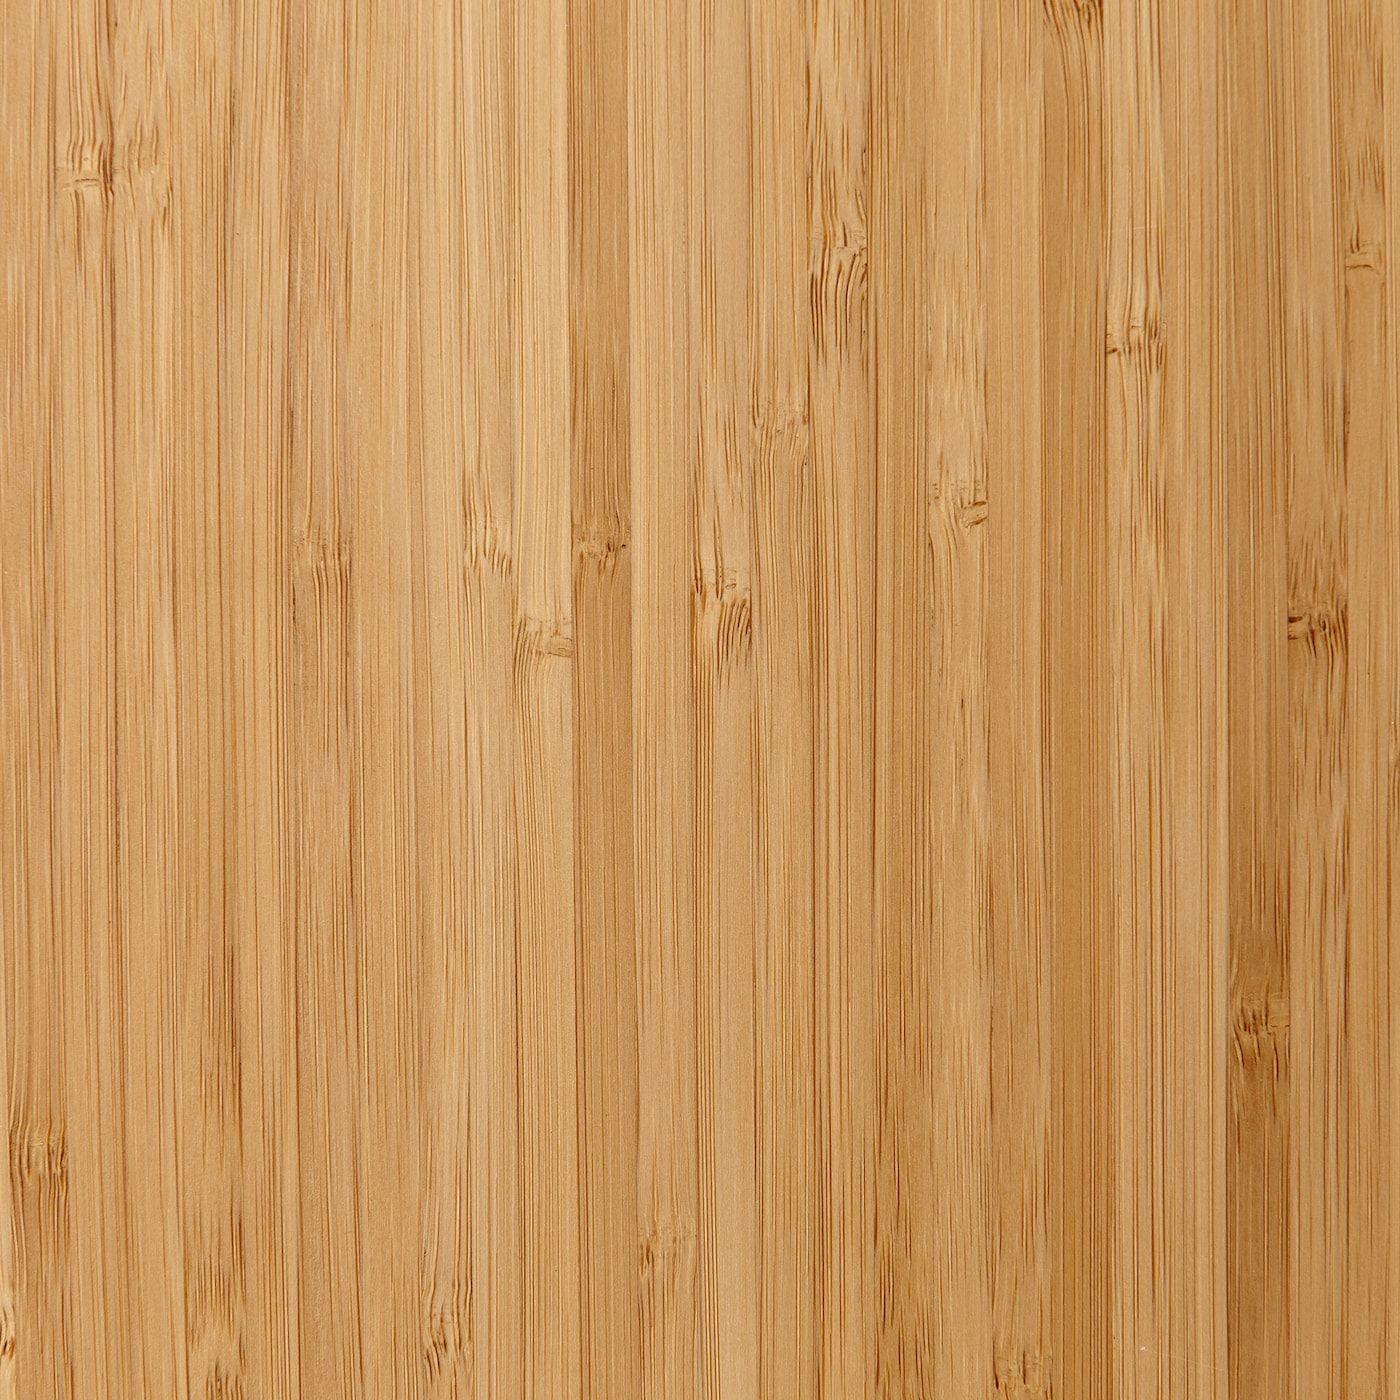 Viskan Countertop Bamboo 24 3 8x15 3 4 Ikea In 2020 Bamboo